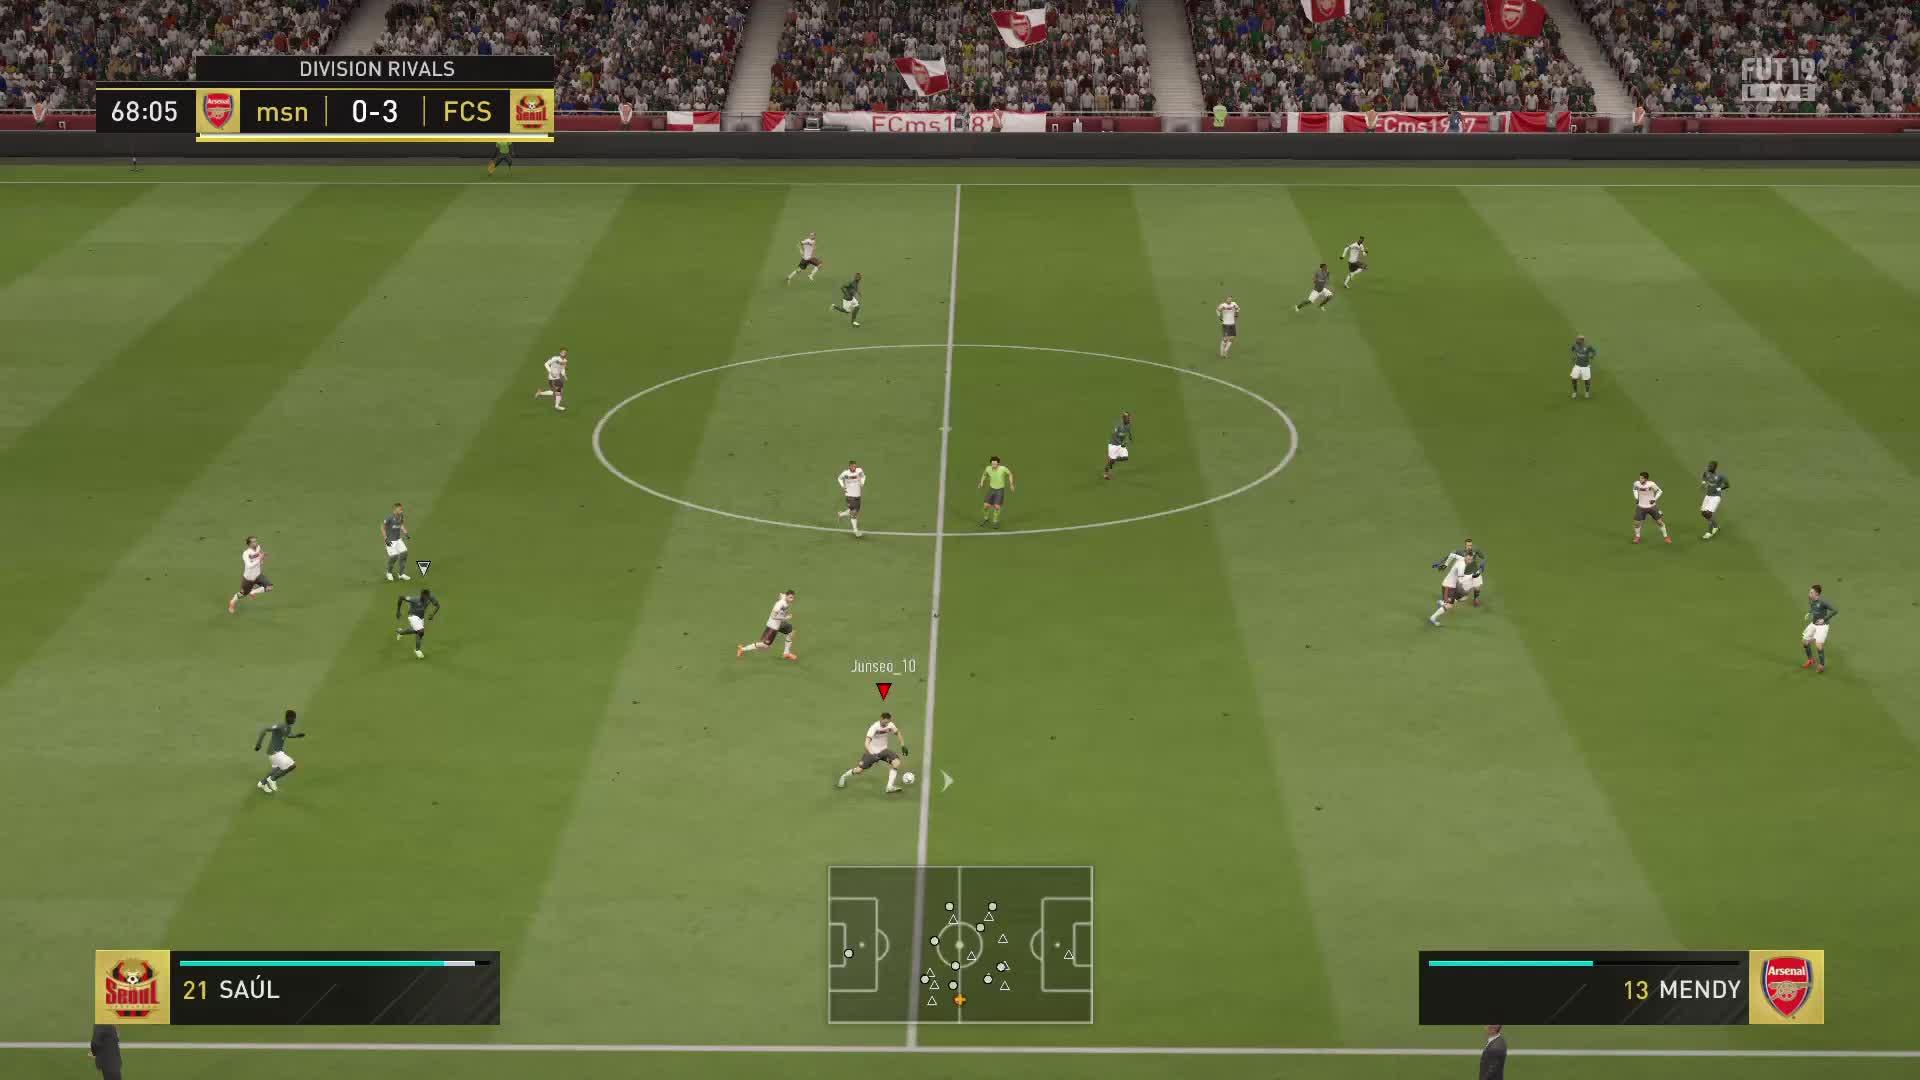 #ps4share, fifa, fifa 19, gaming, jamie lee, playstation 4, sony interactive entertainment, FIFA 19_20190503003502 GIFs